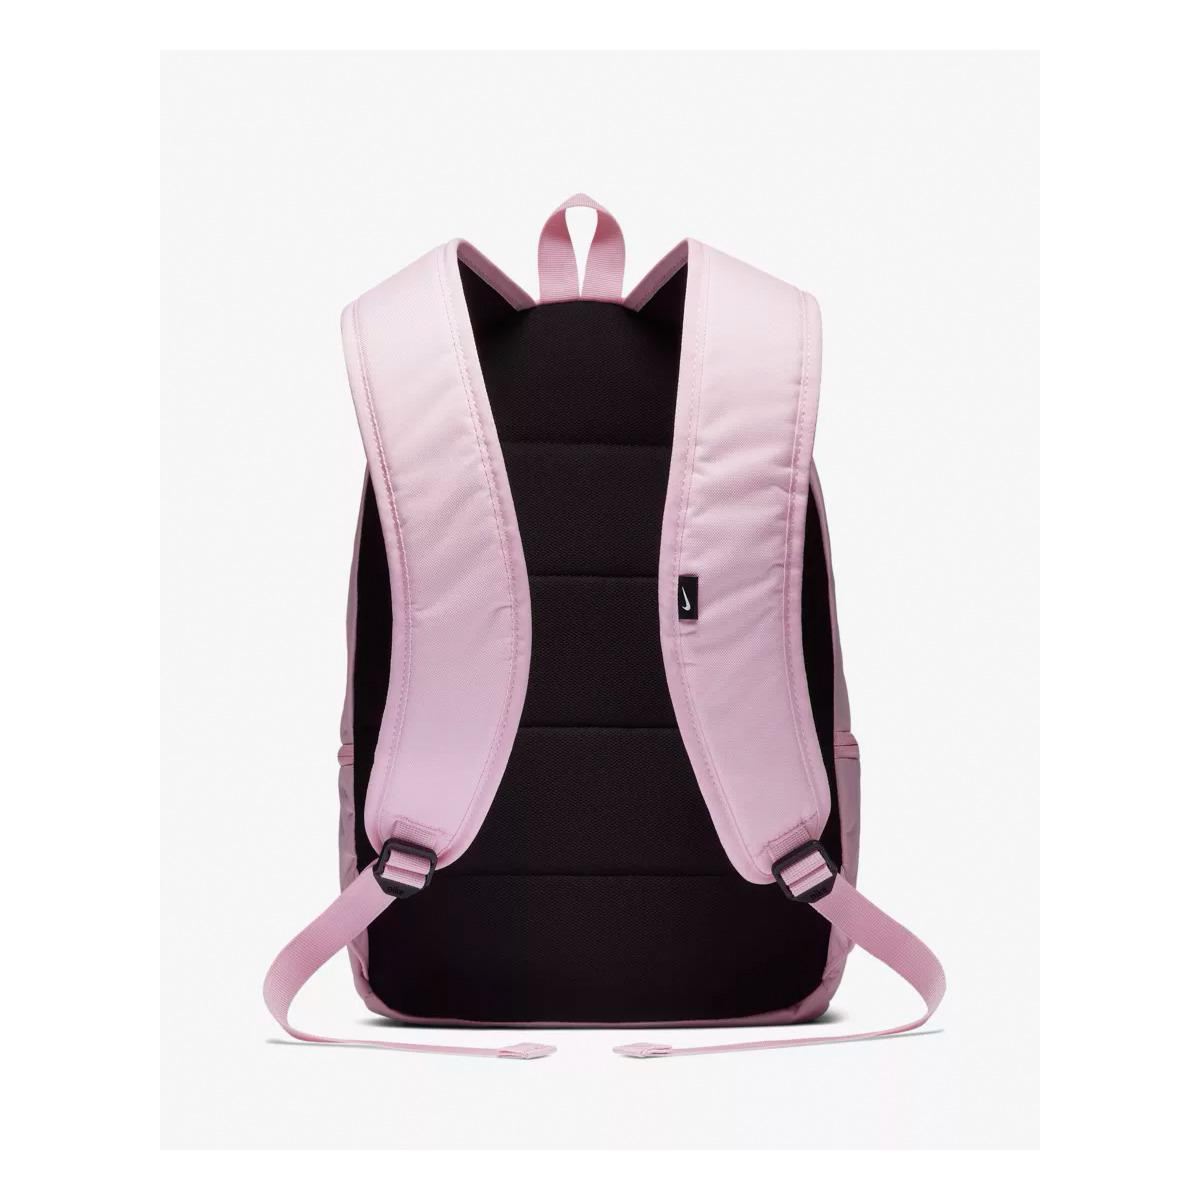 d88328c8d Nike Pink Heritage Floral Logo Backpack in Pink - Lyst